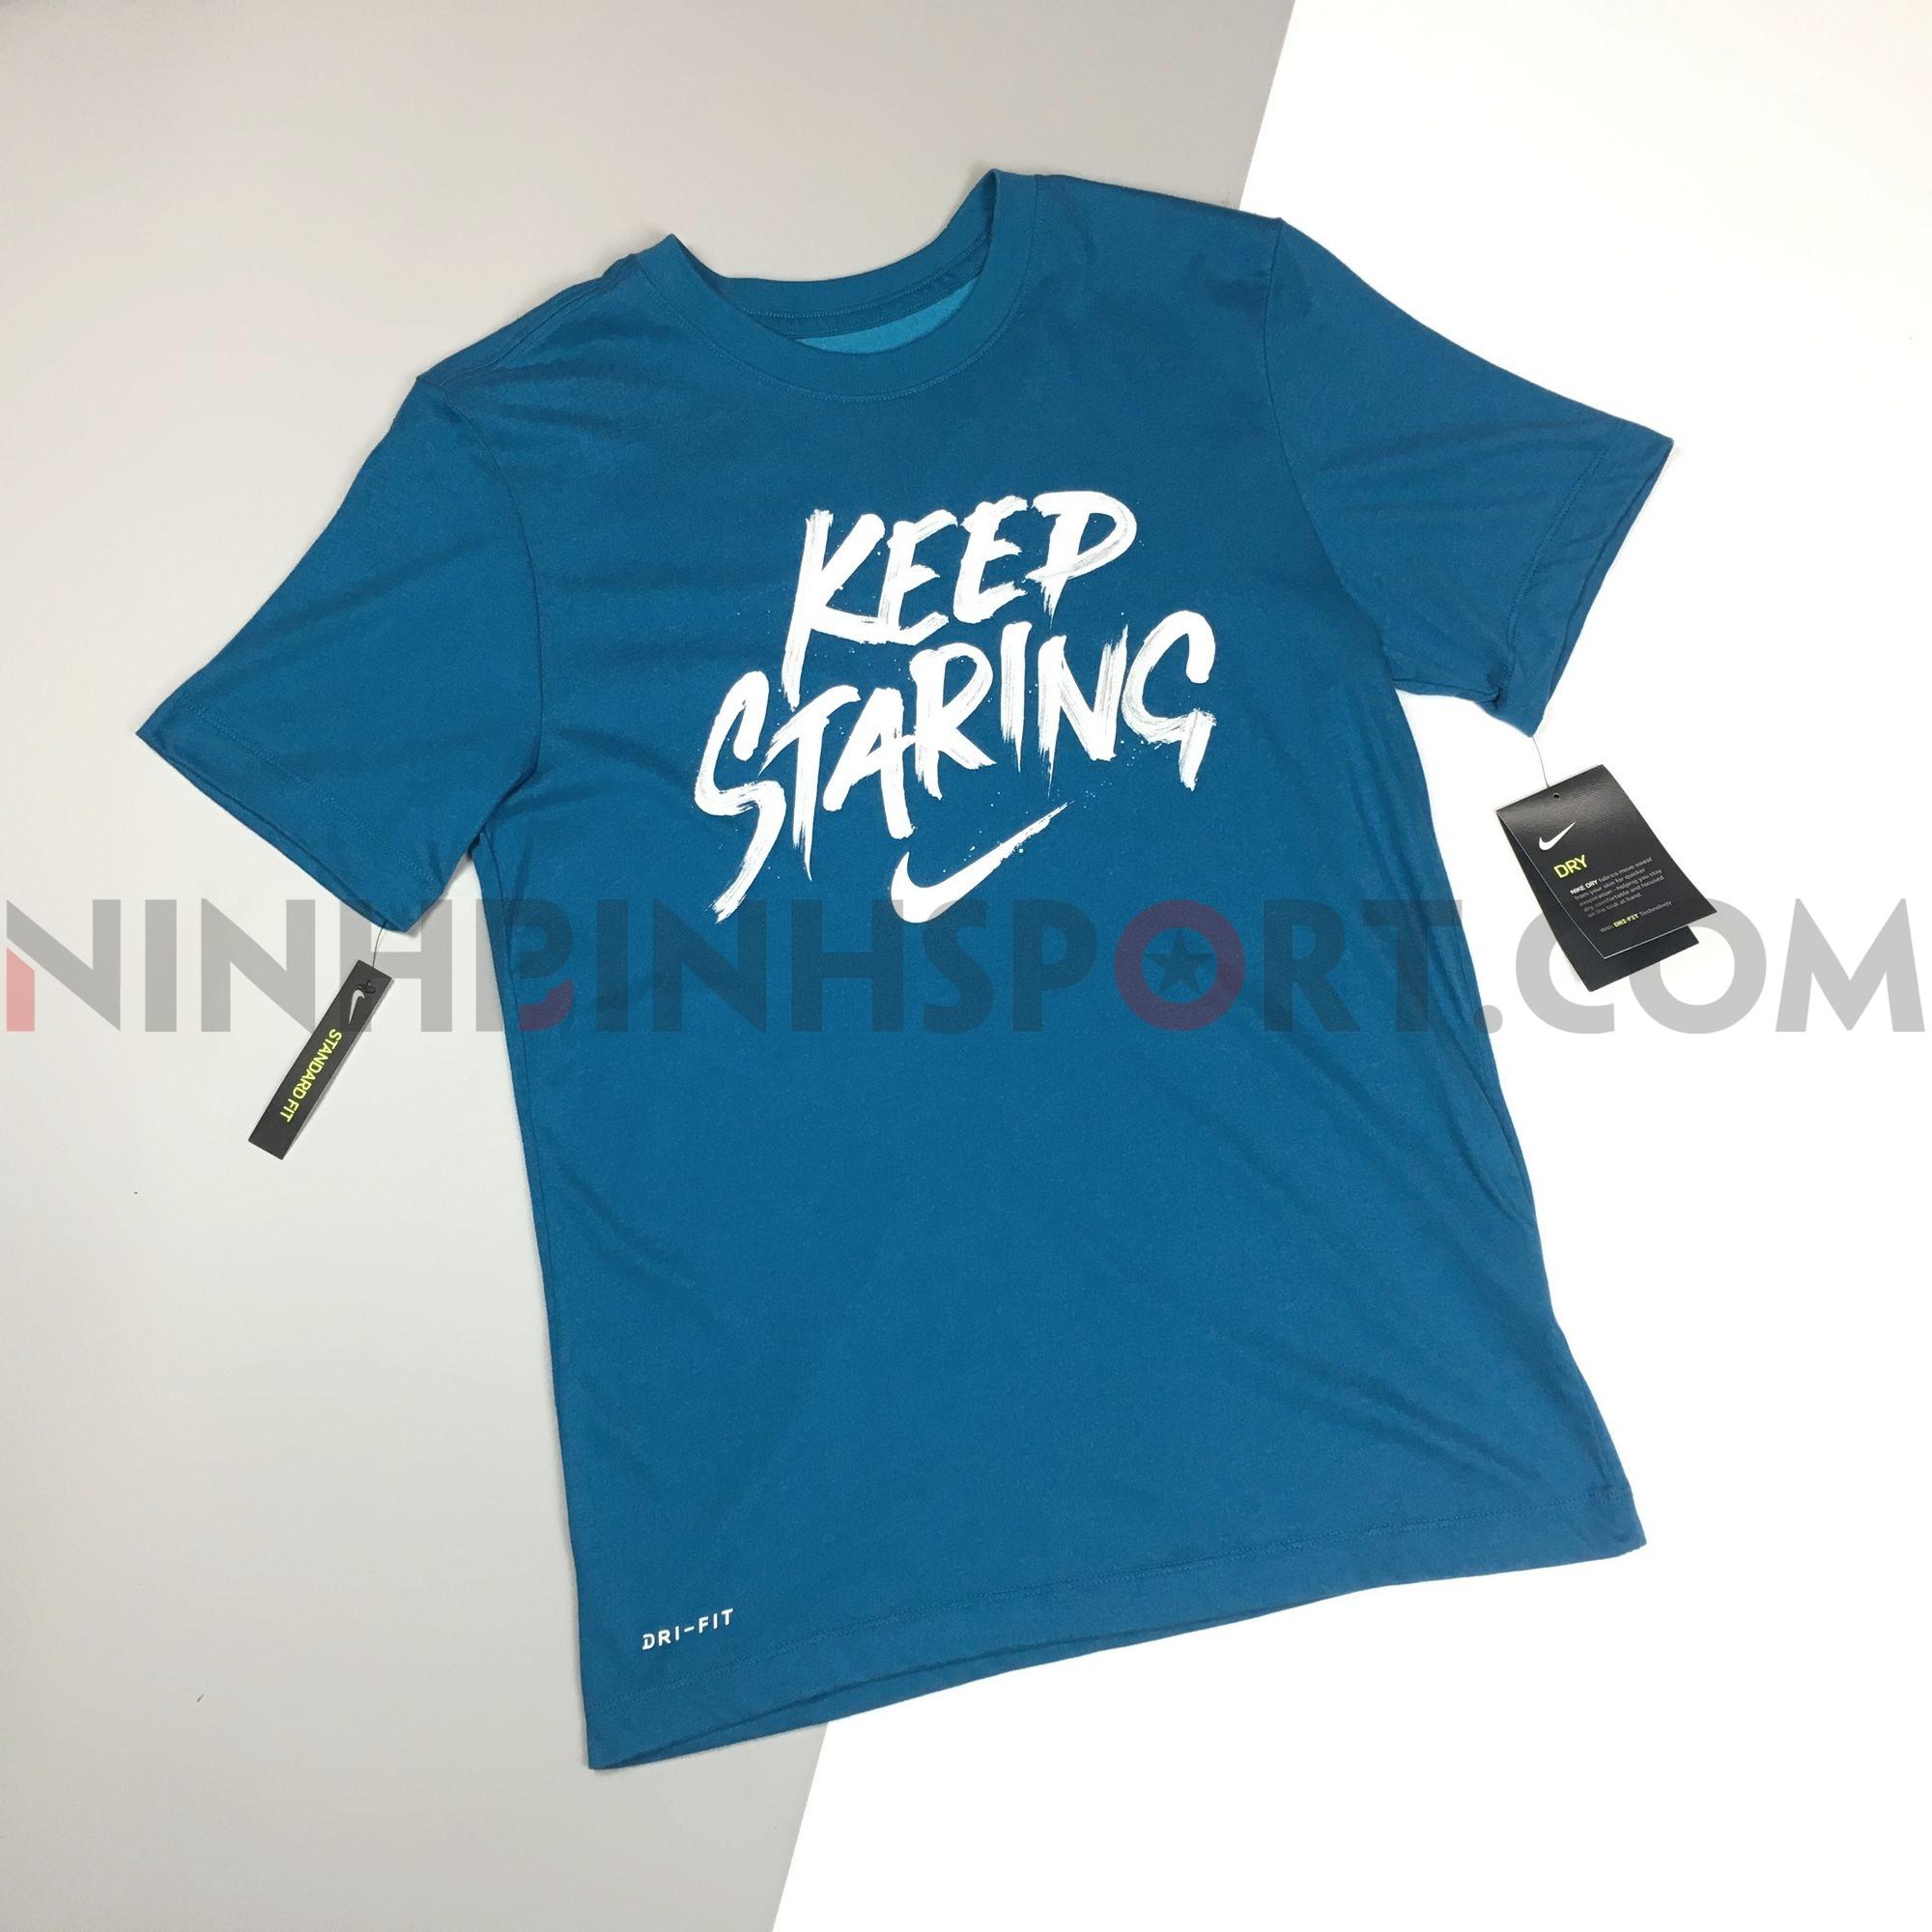 Áo thể thao nam Nike Dri-fit Cotton BQ1839-301